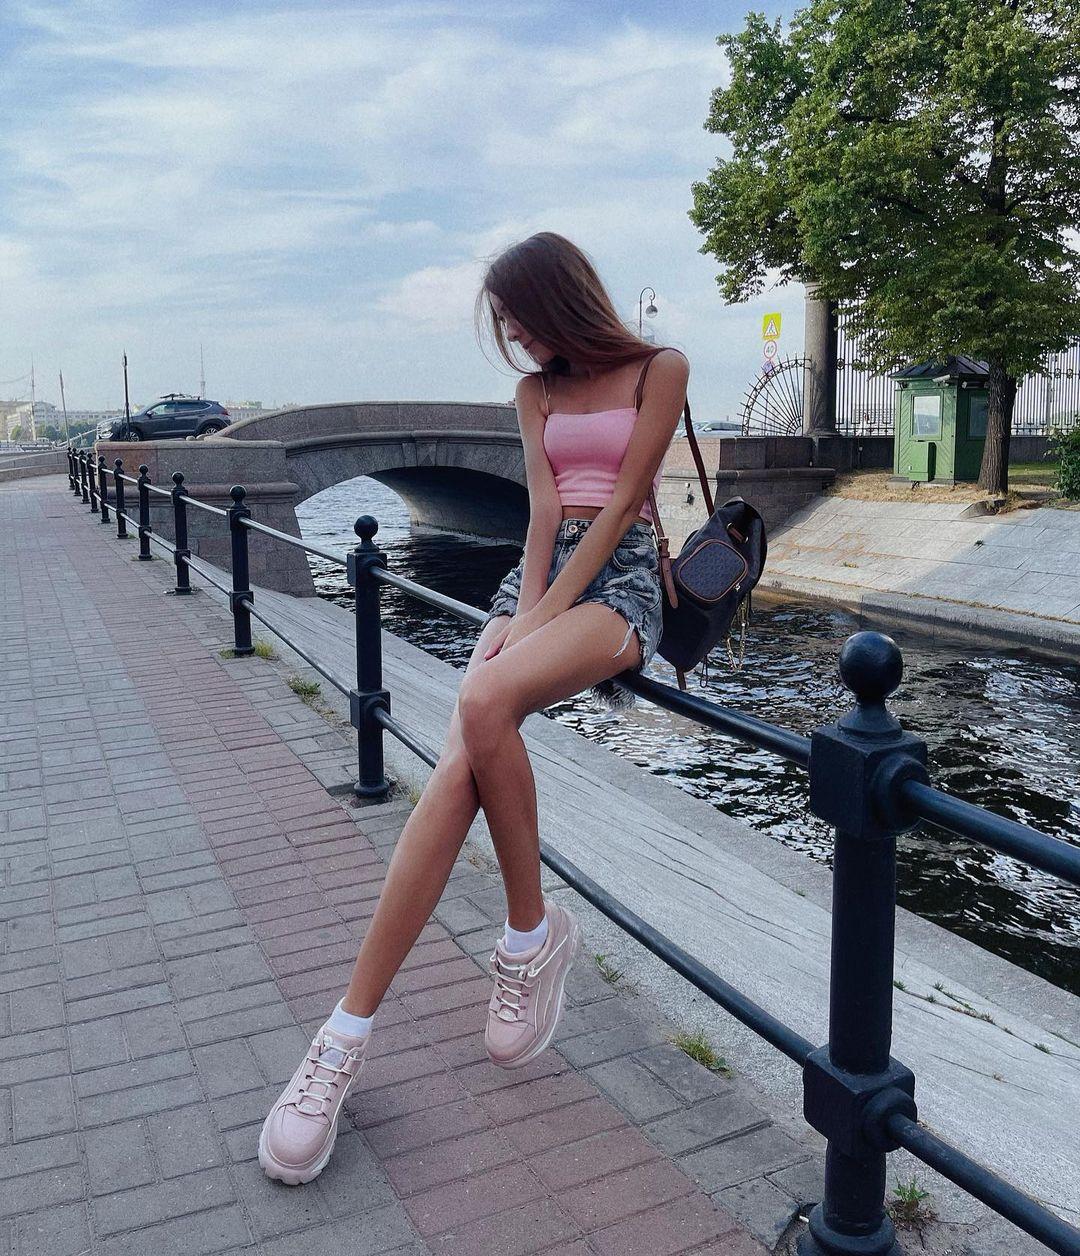 Ksenia-Angela-Wallpapers-Insta-Fit-Bio-3